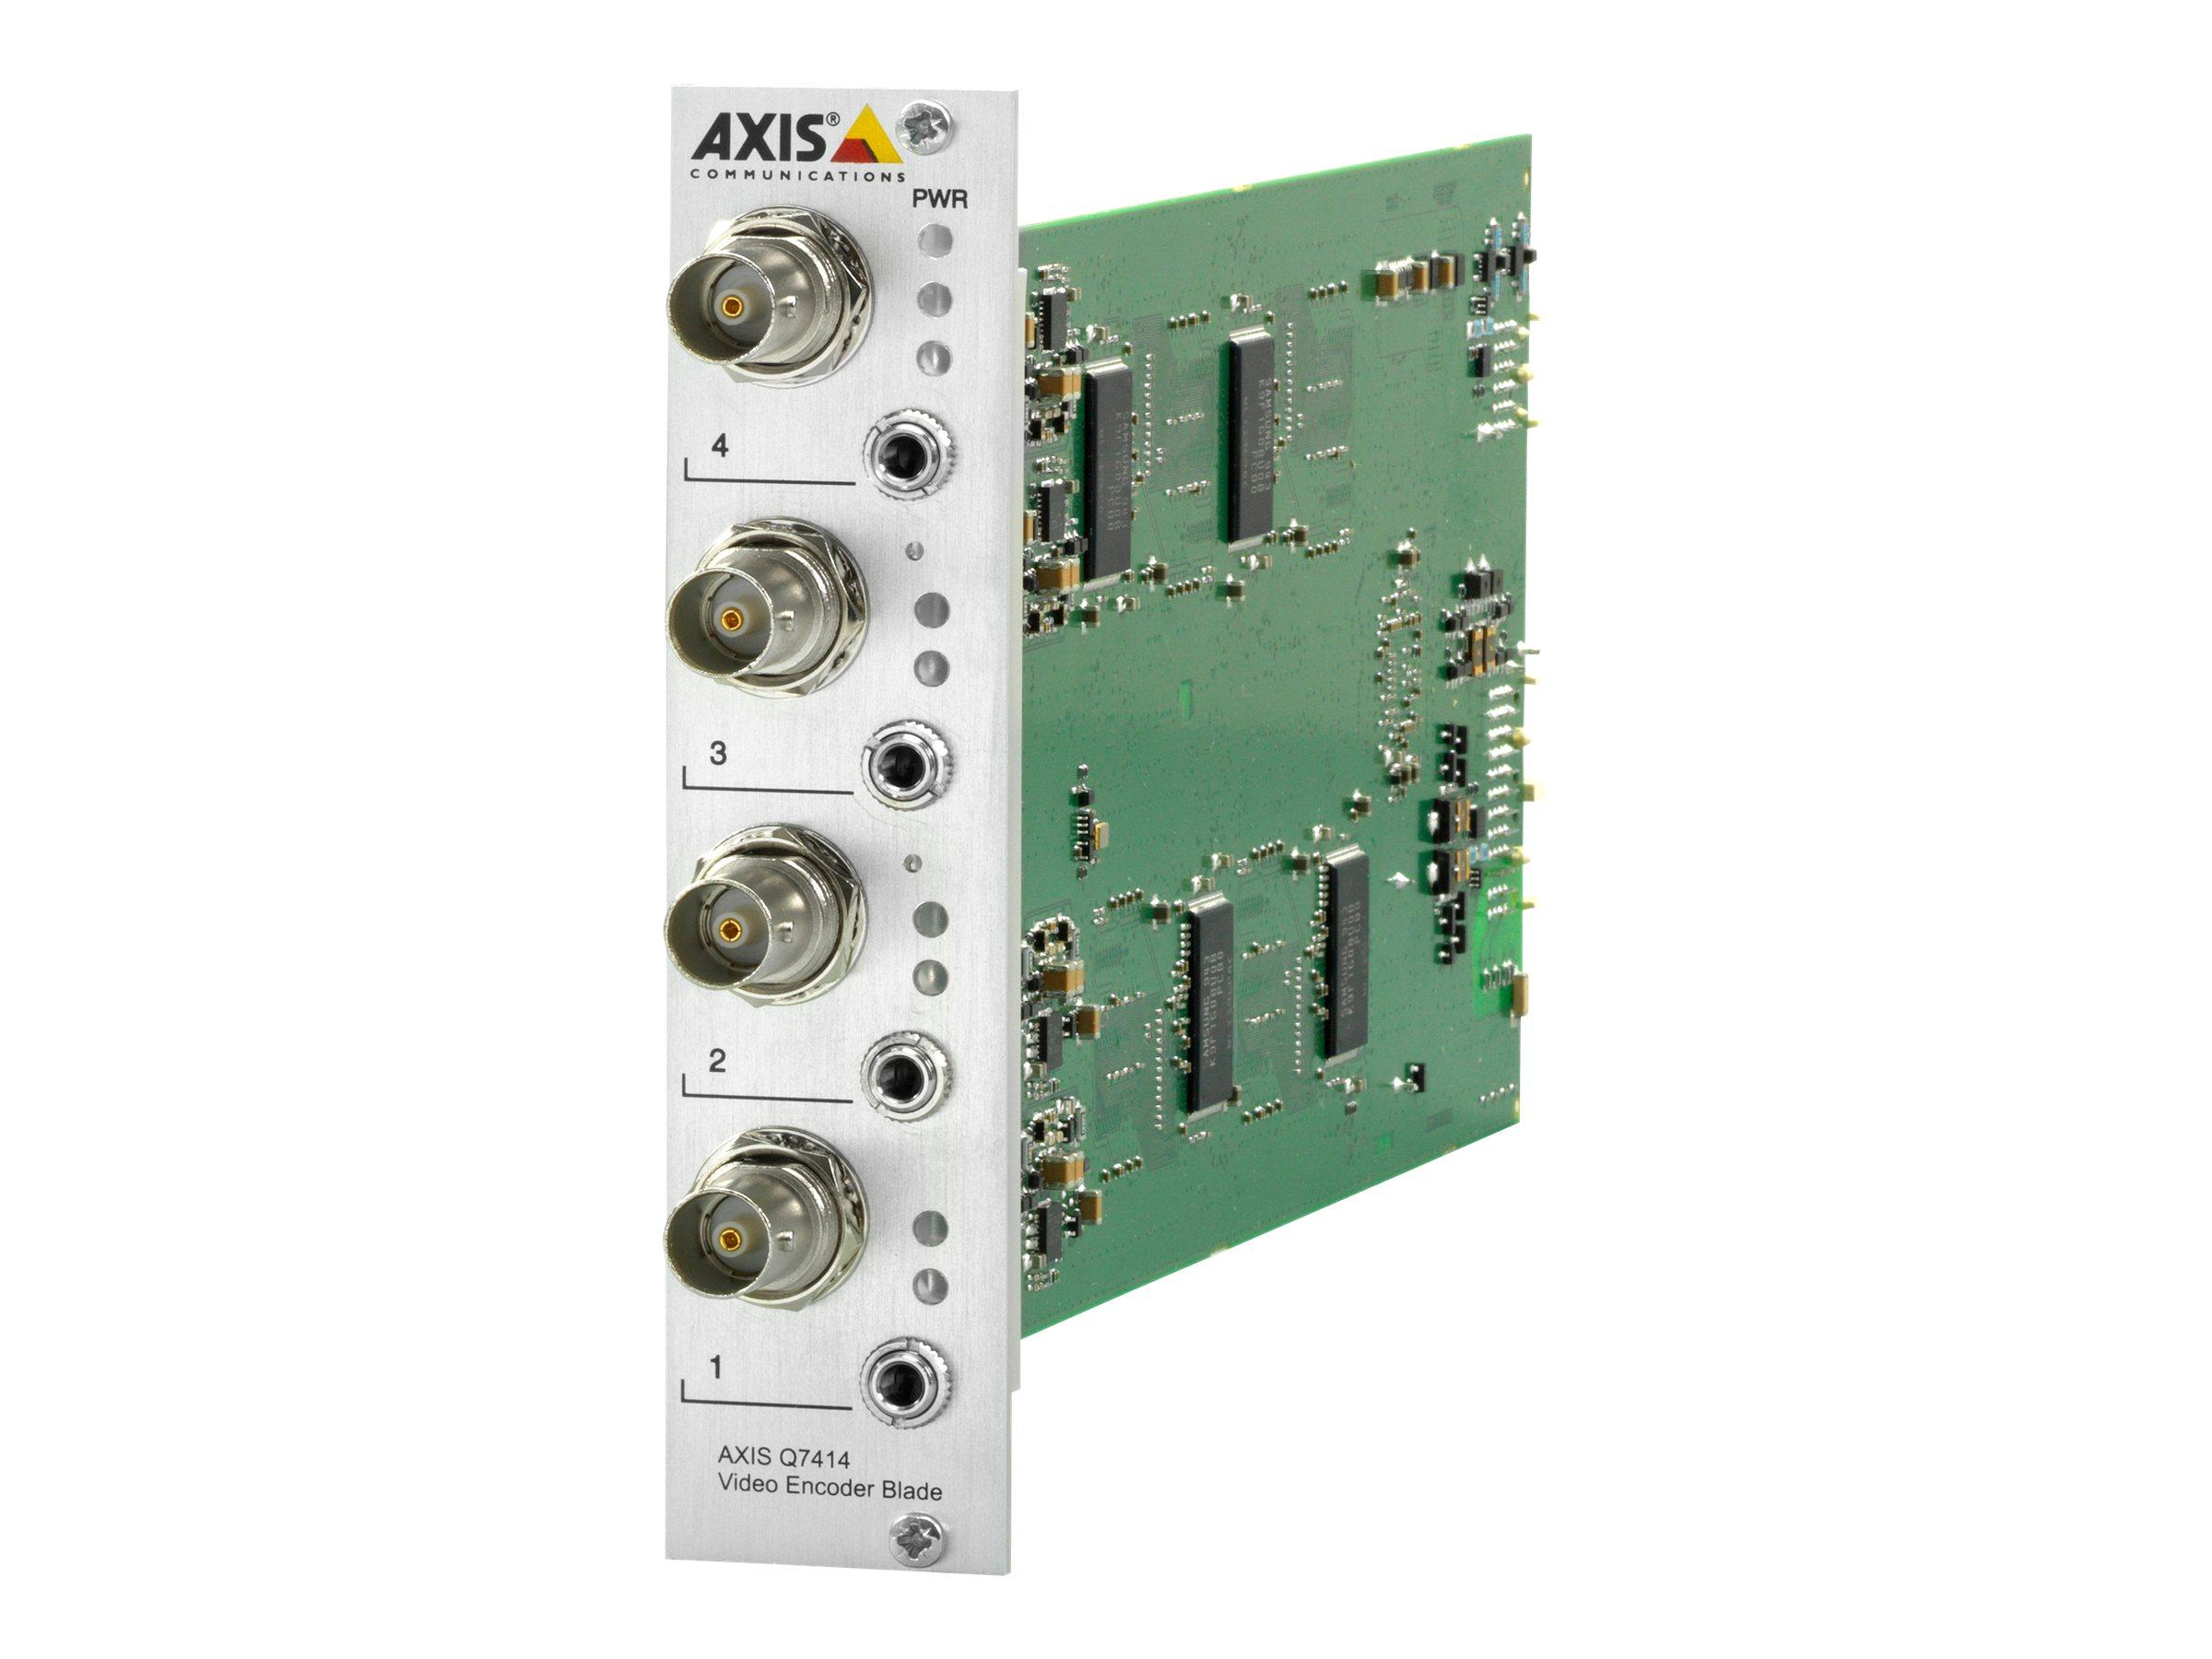 AXIS Q7414 Video Encoder Blade - Video-Server - 4 Kanäle